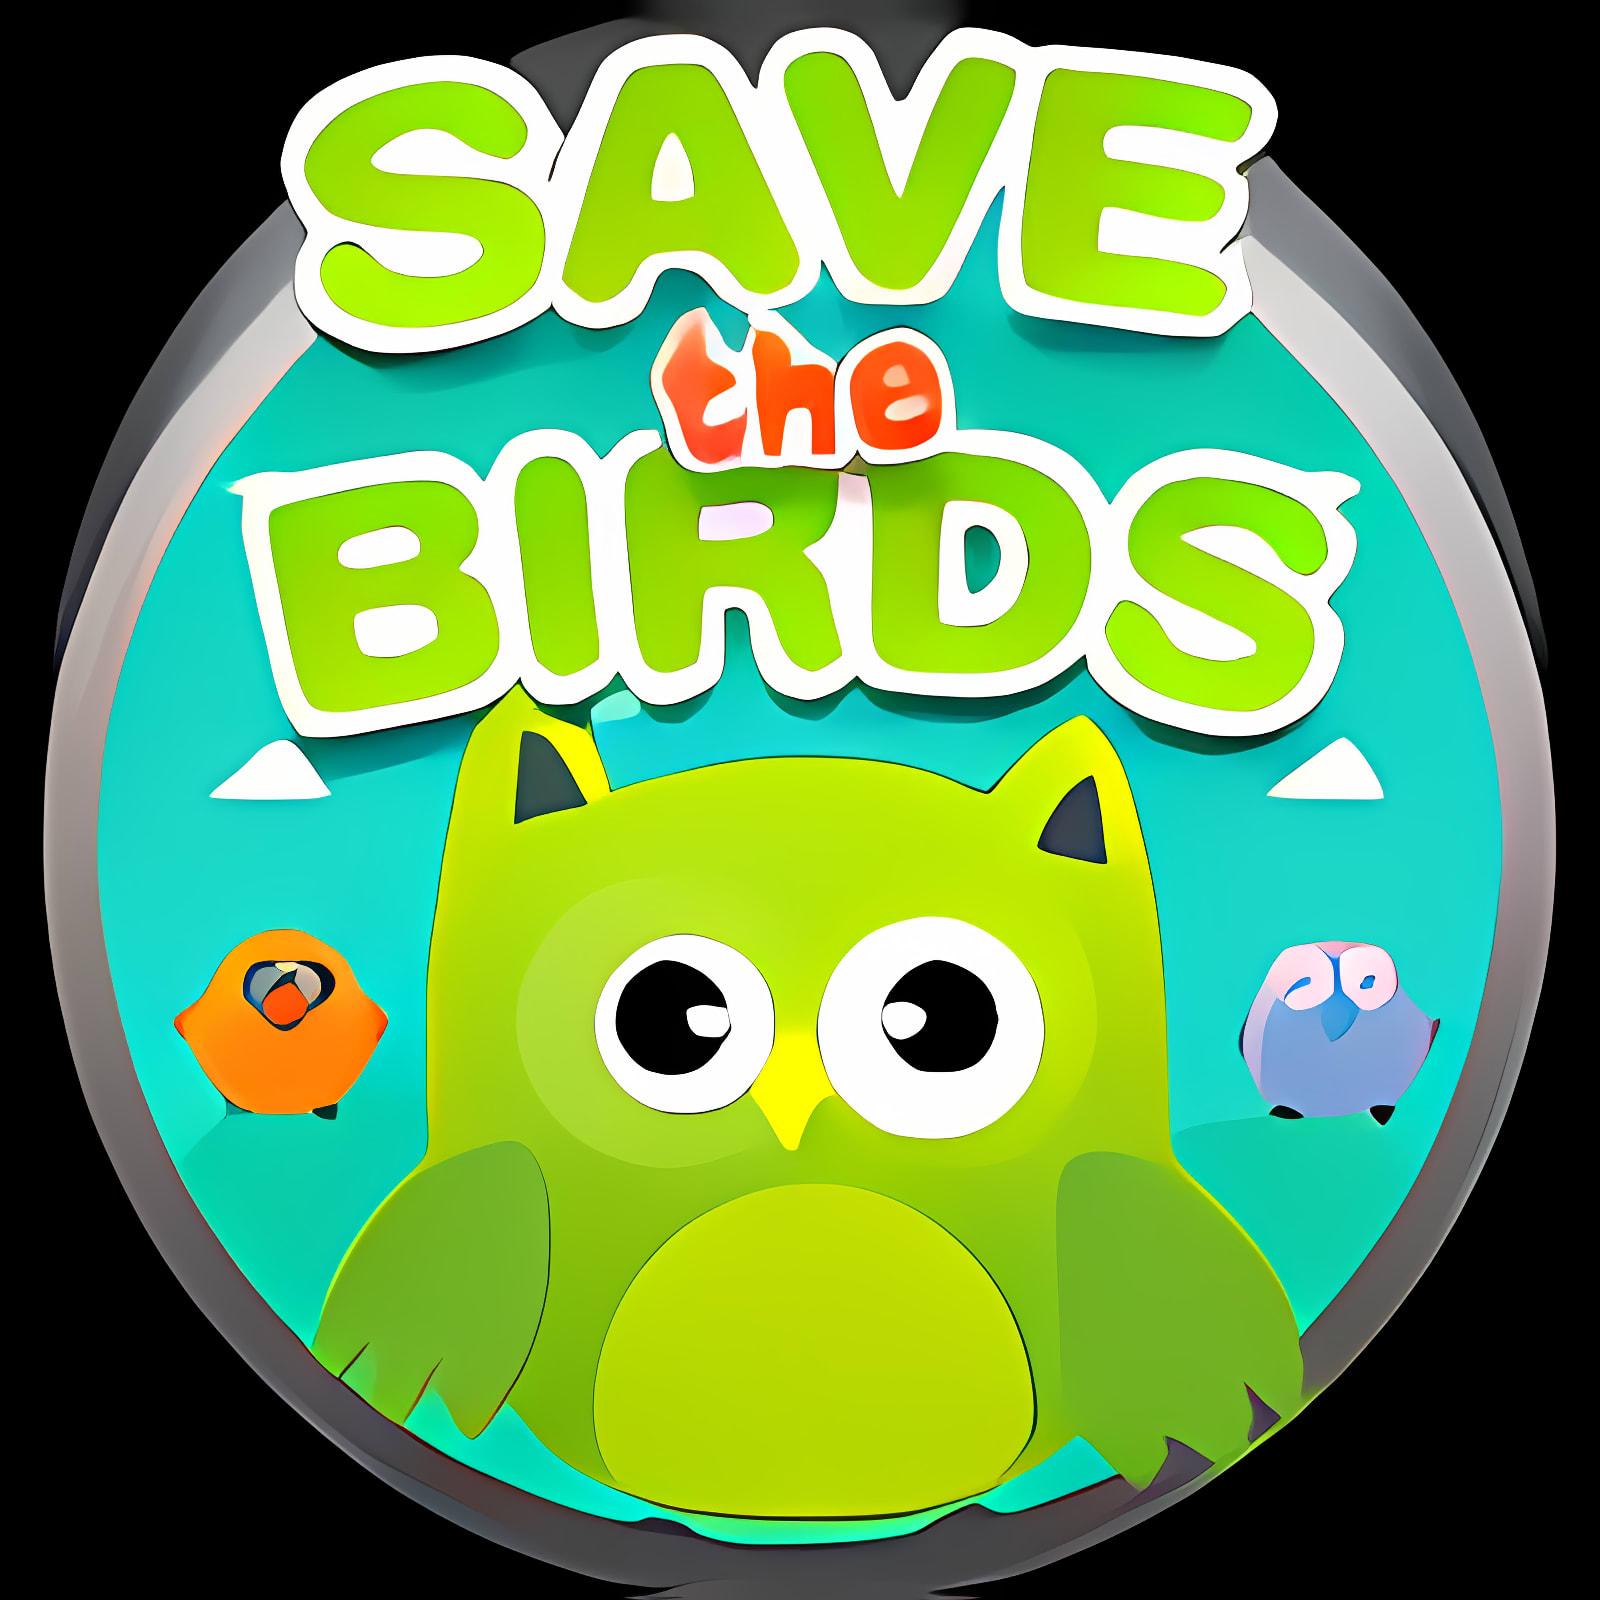 Save The Birds - Bounce Balls 1.4